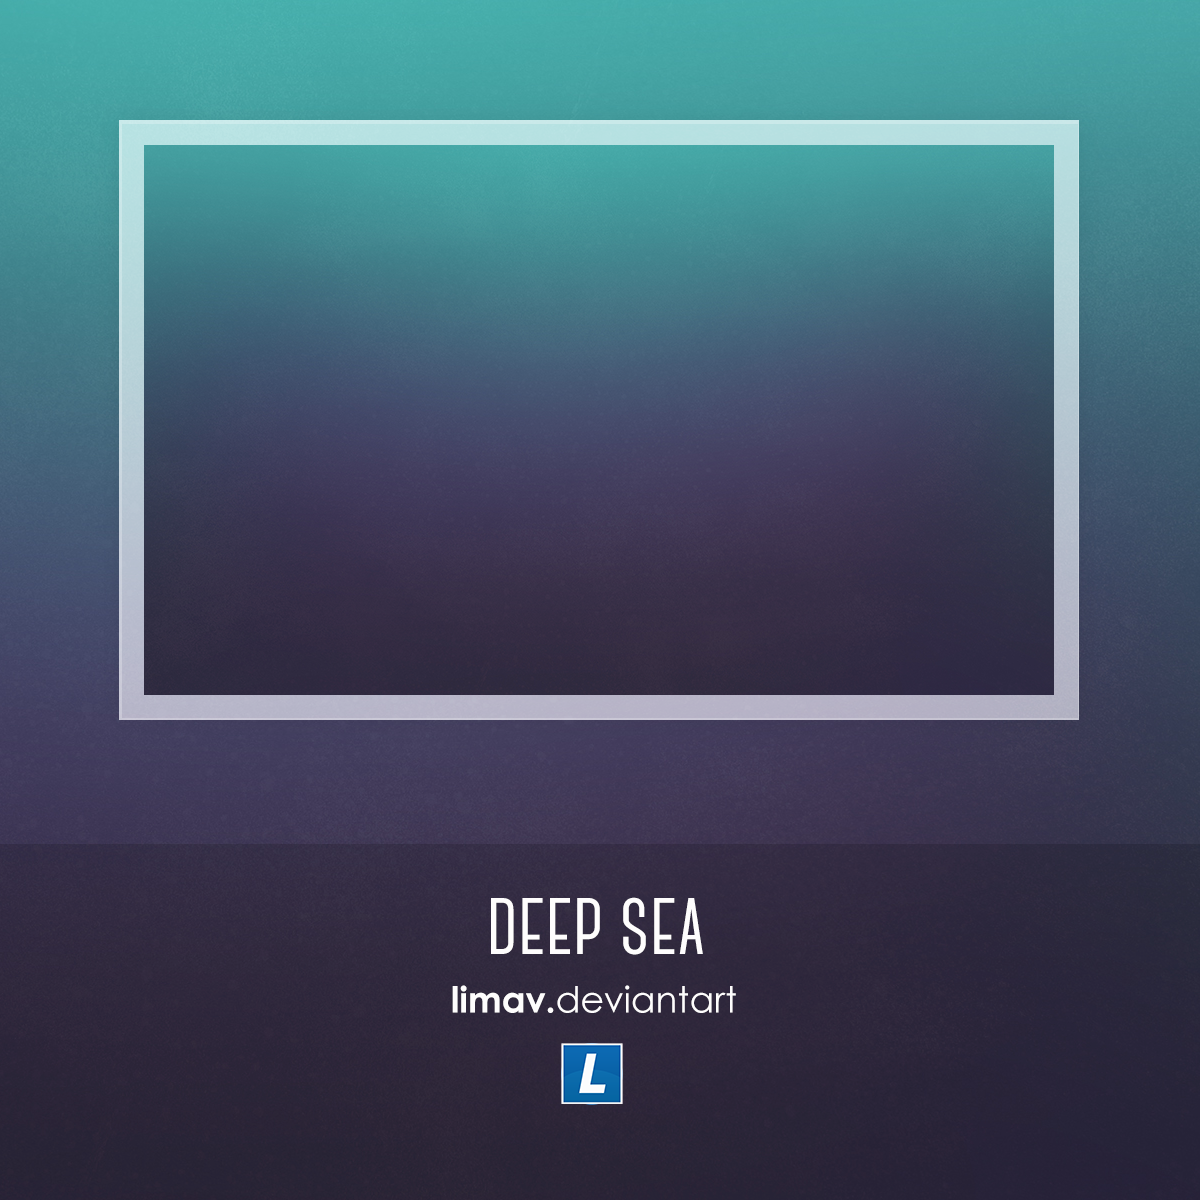 Deep Sea - Wallpaper by limav